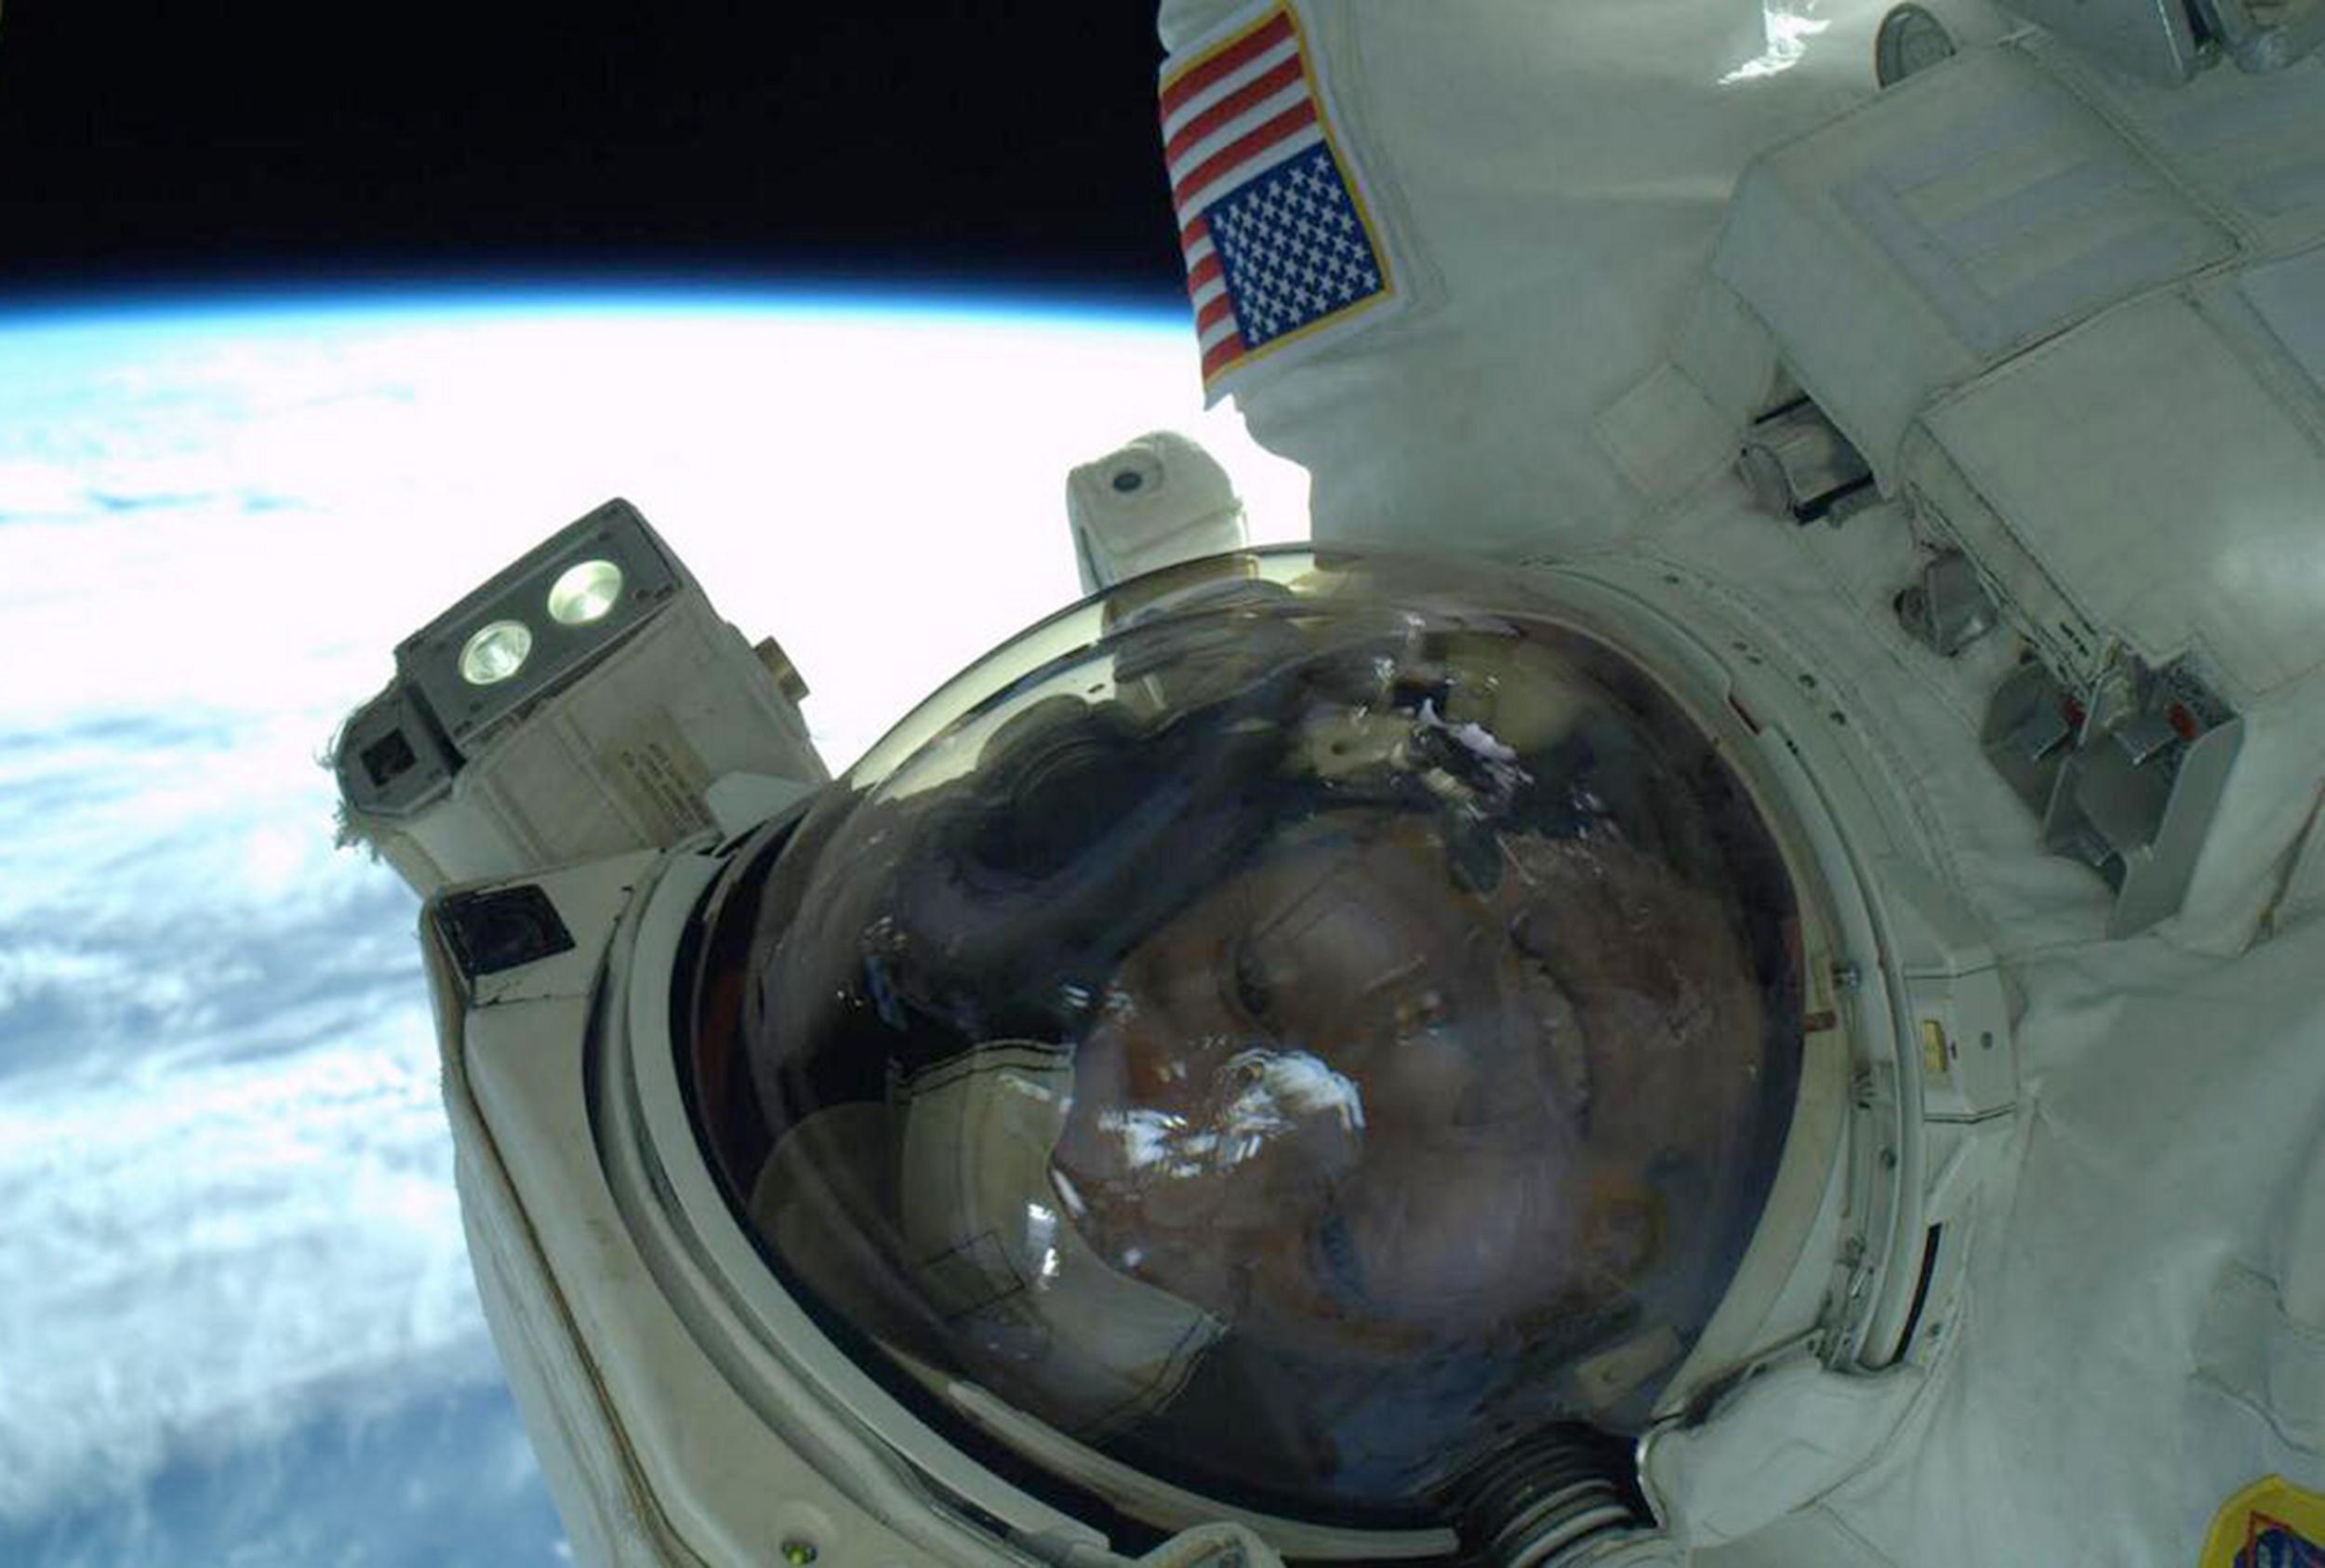 Spacewalk Selfie! NASA Astronaut Shares Self-Portrait ...